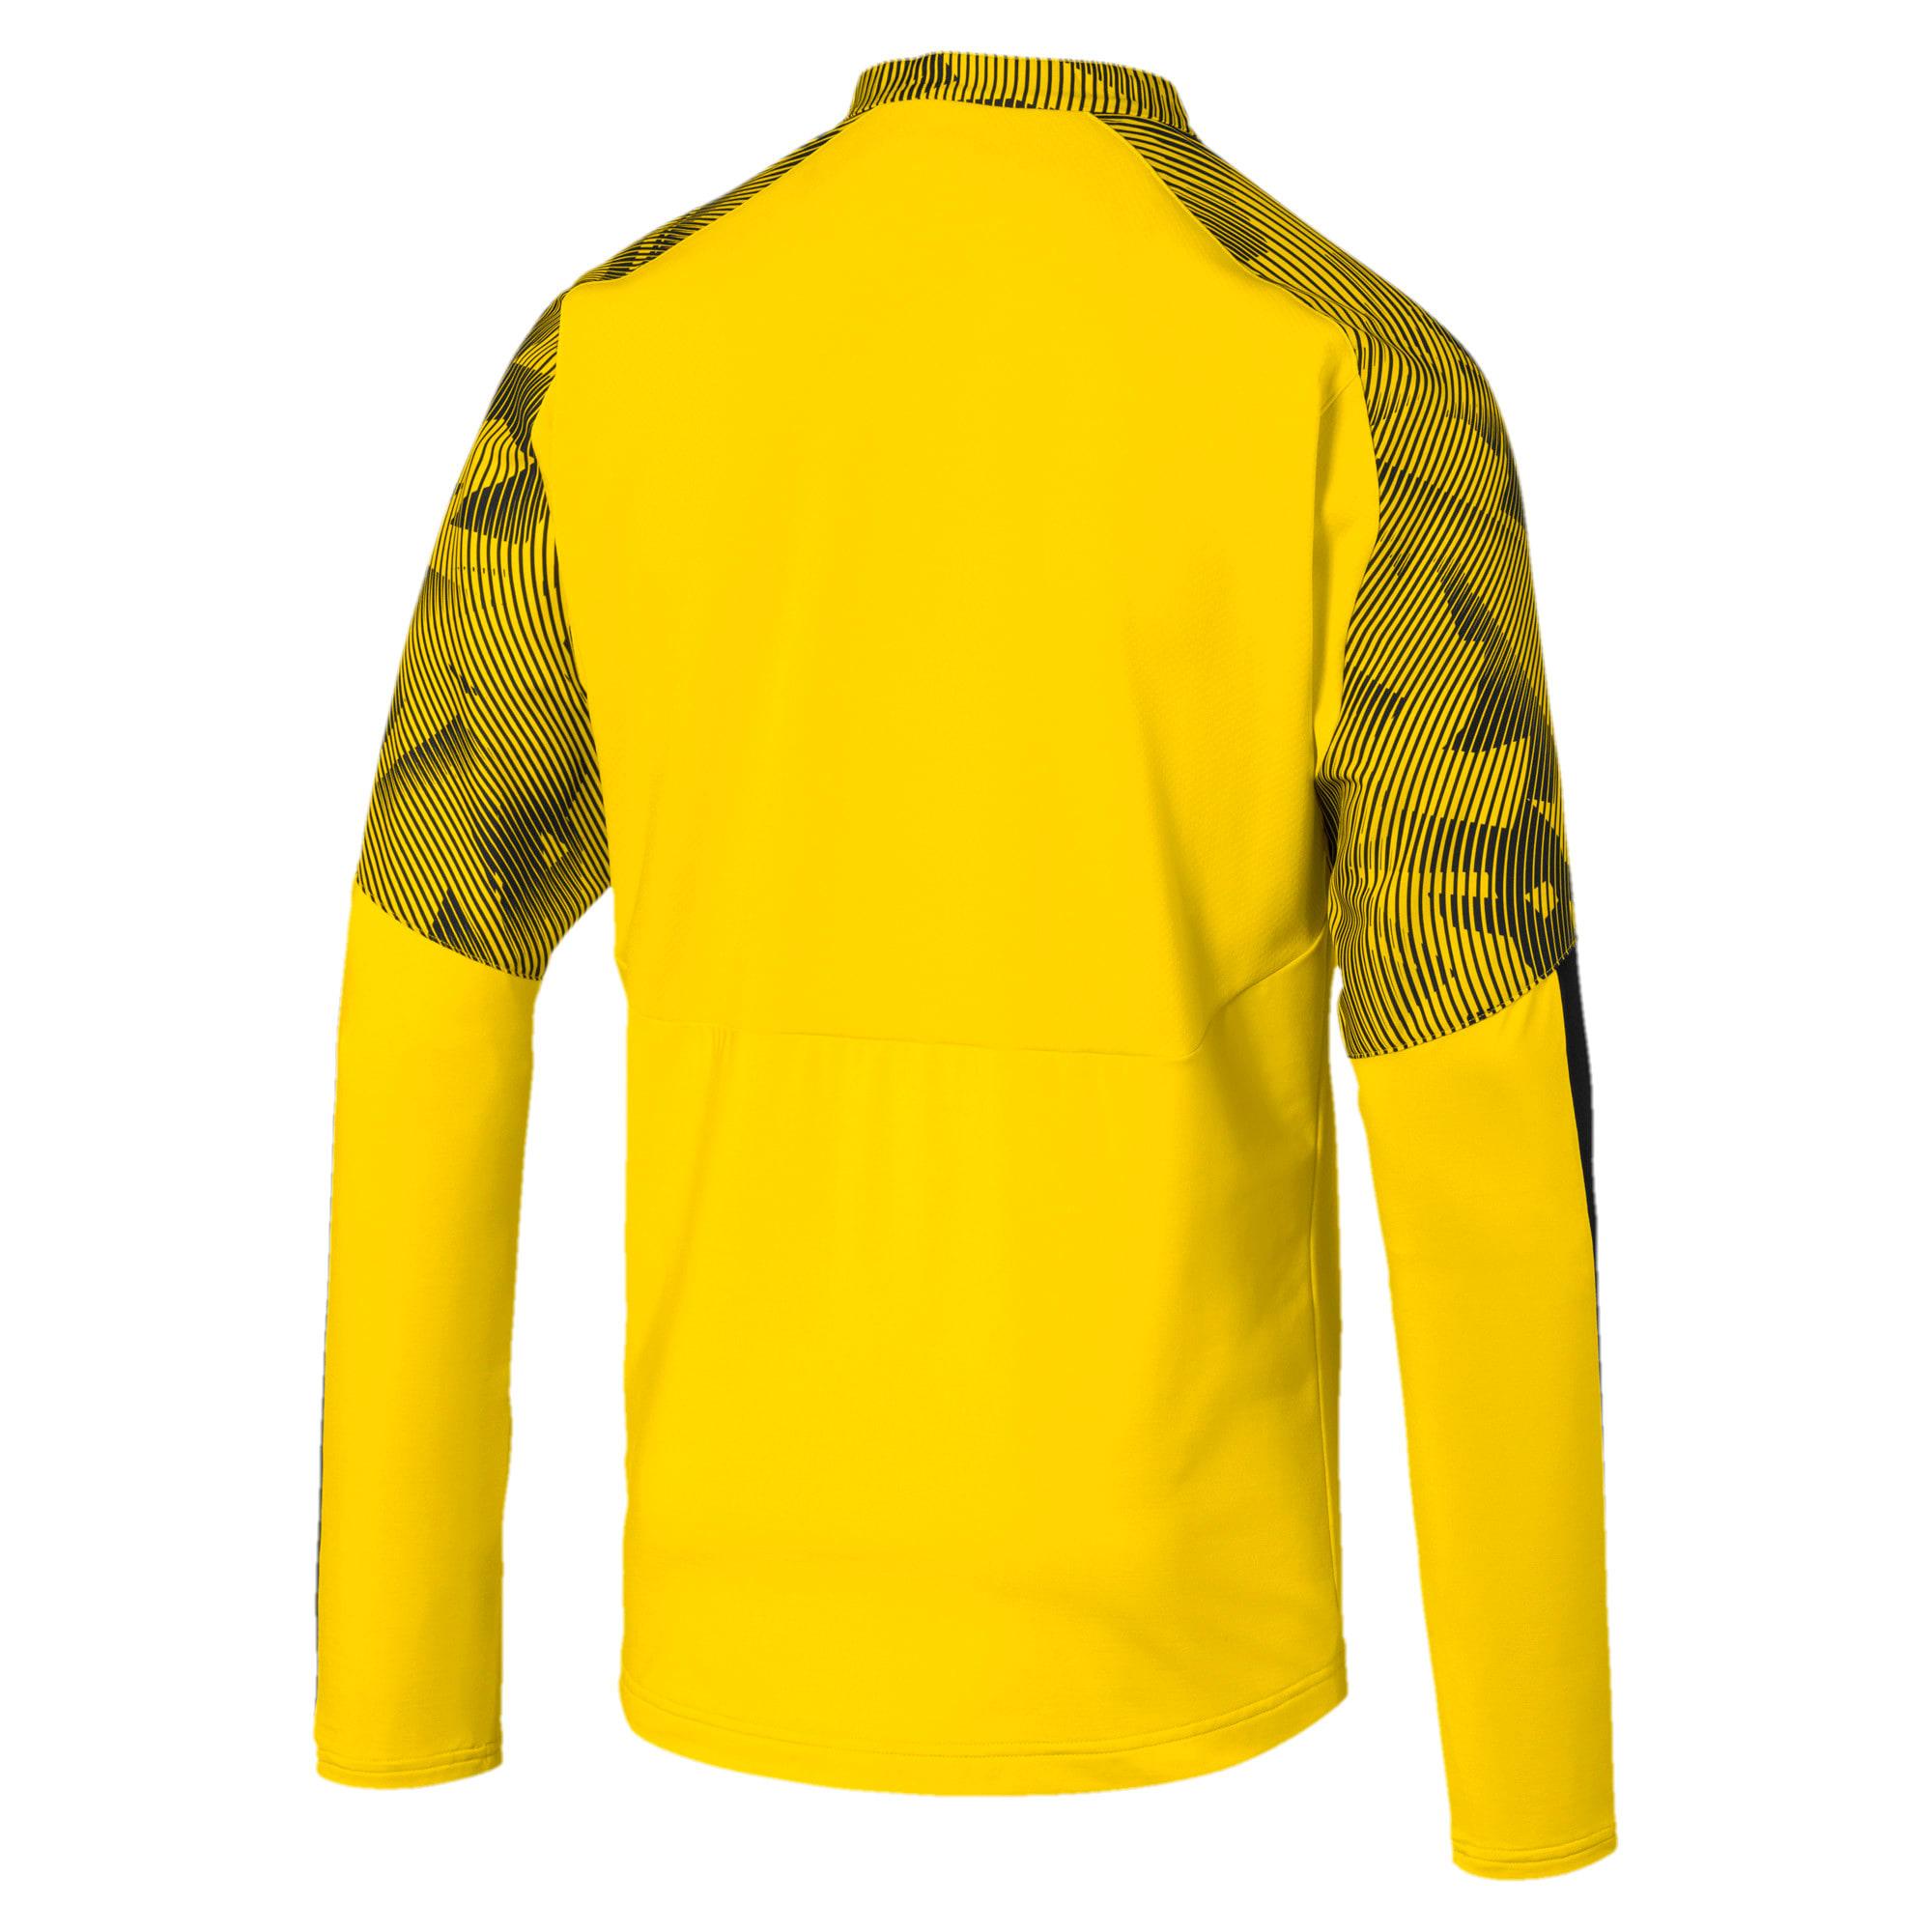 Thumbnail 5 of BVB Quarter Zip Men's Training Top, Cyber Yellow-Puma Black, medium